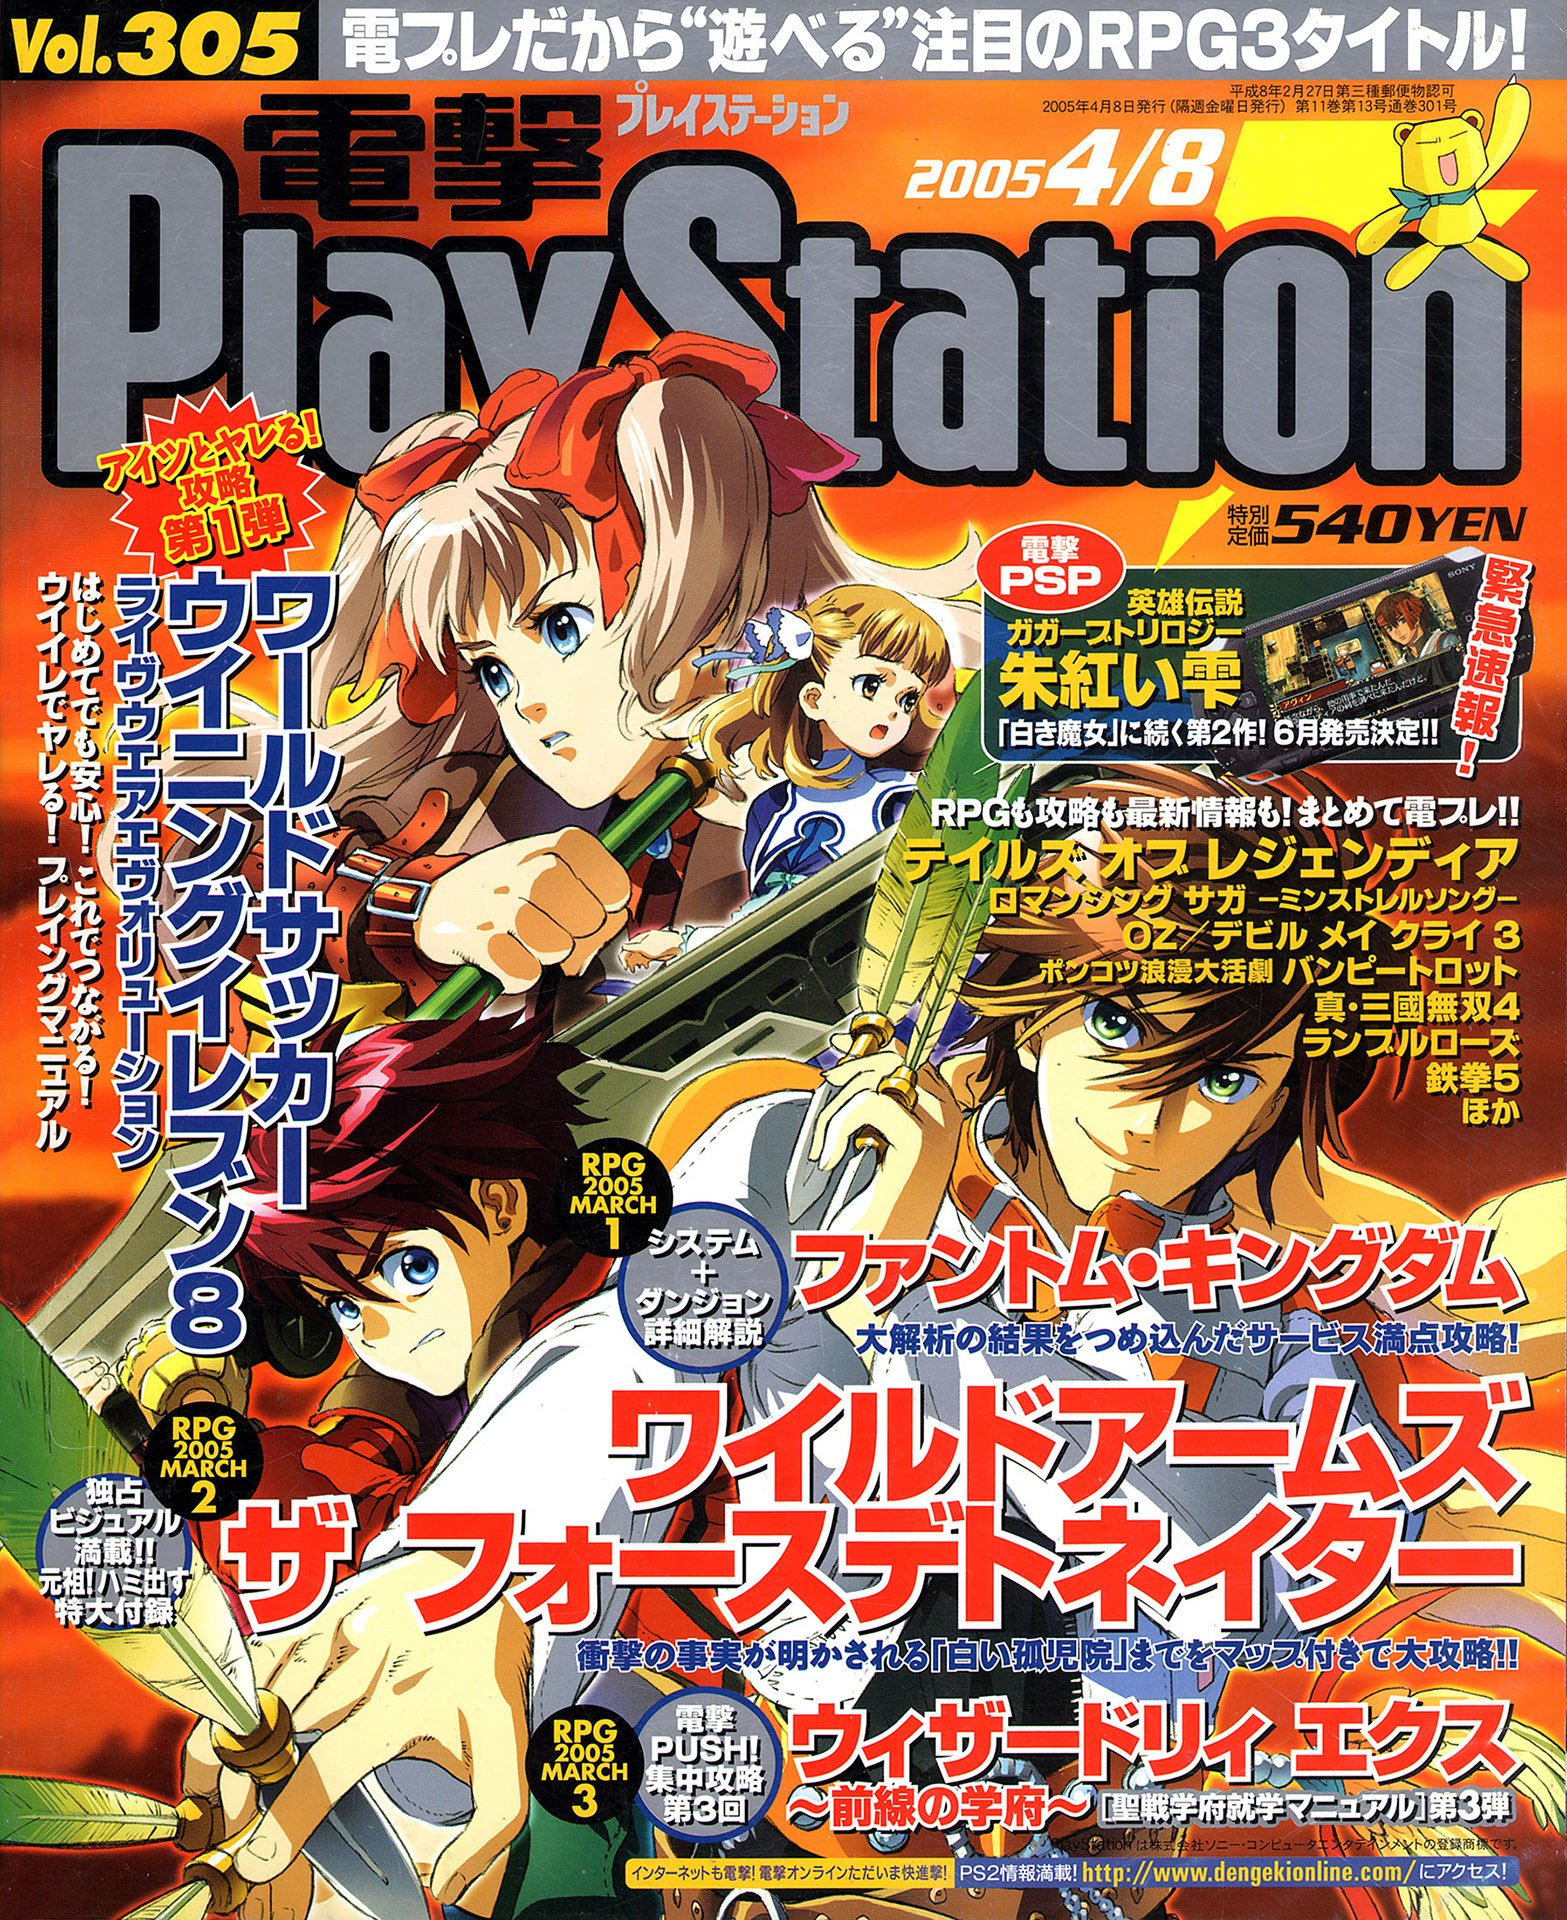 Dengeki PlayStation 305 (April 8, 2005)